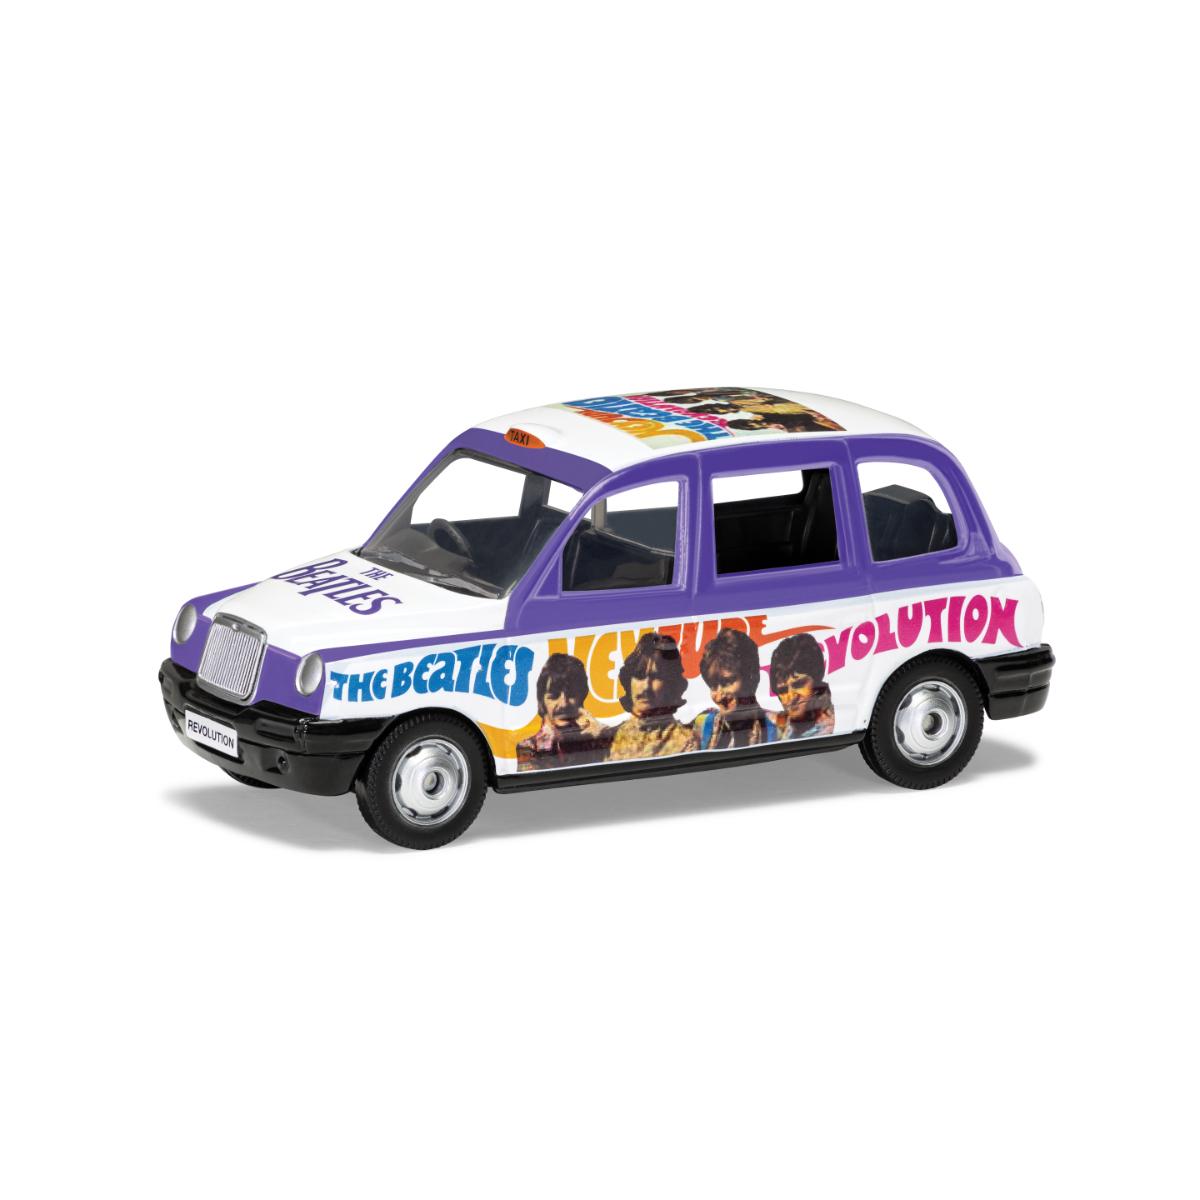 Hornby Hey Jude/Revolution London Taxi